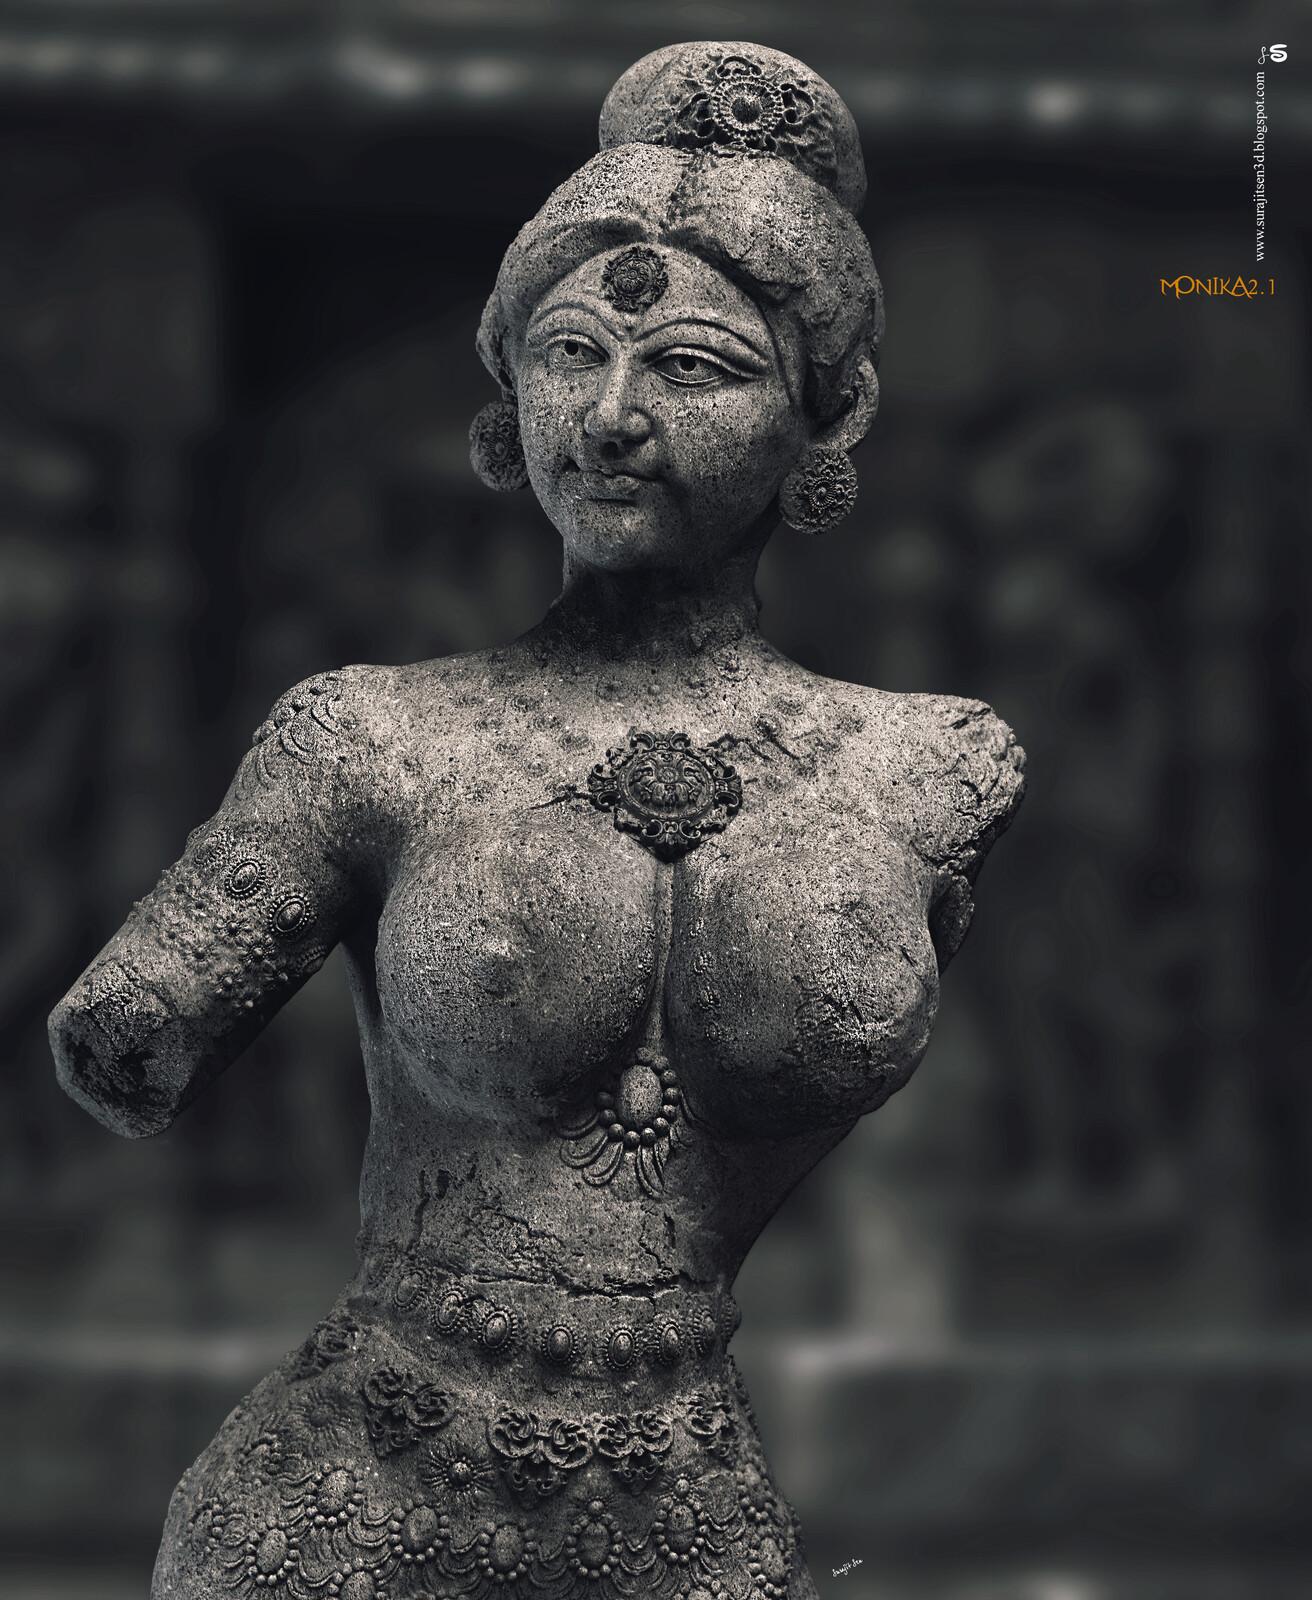 Monika2.1 Digital Sculpture Inspired by Indian Art and Sculptures. Background music- #hanszimmermusic